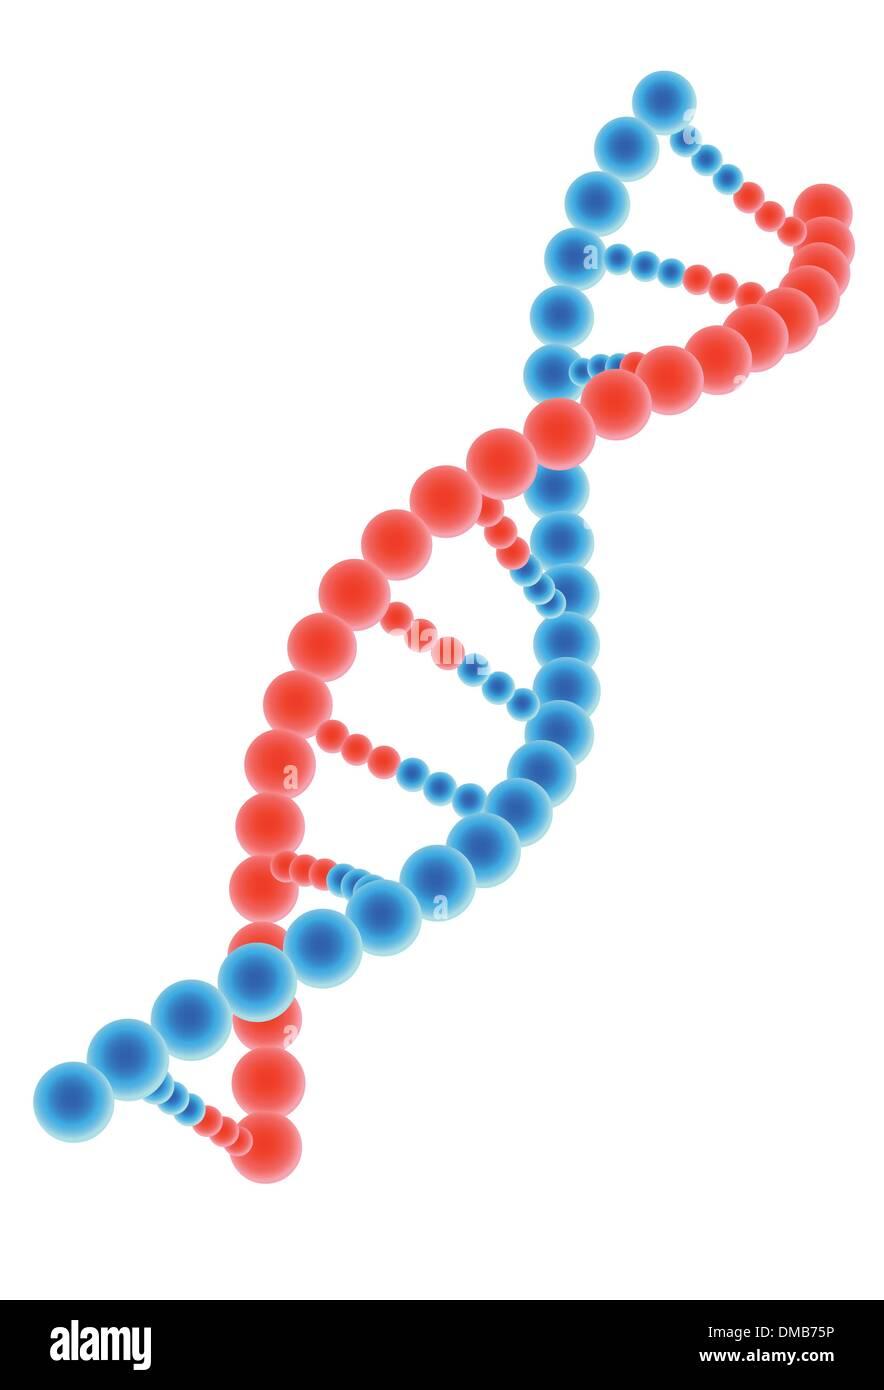 DNA model on white background - Stock Image